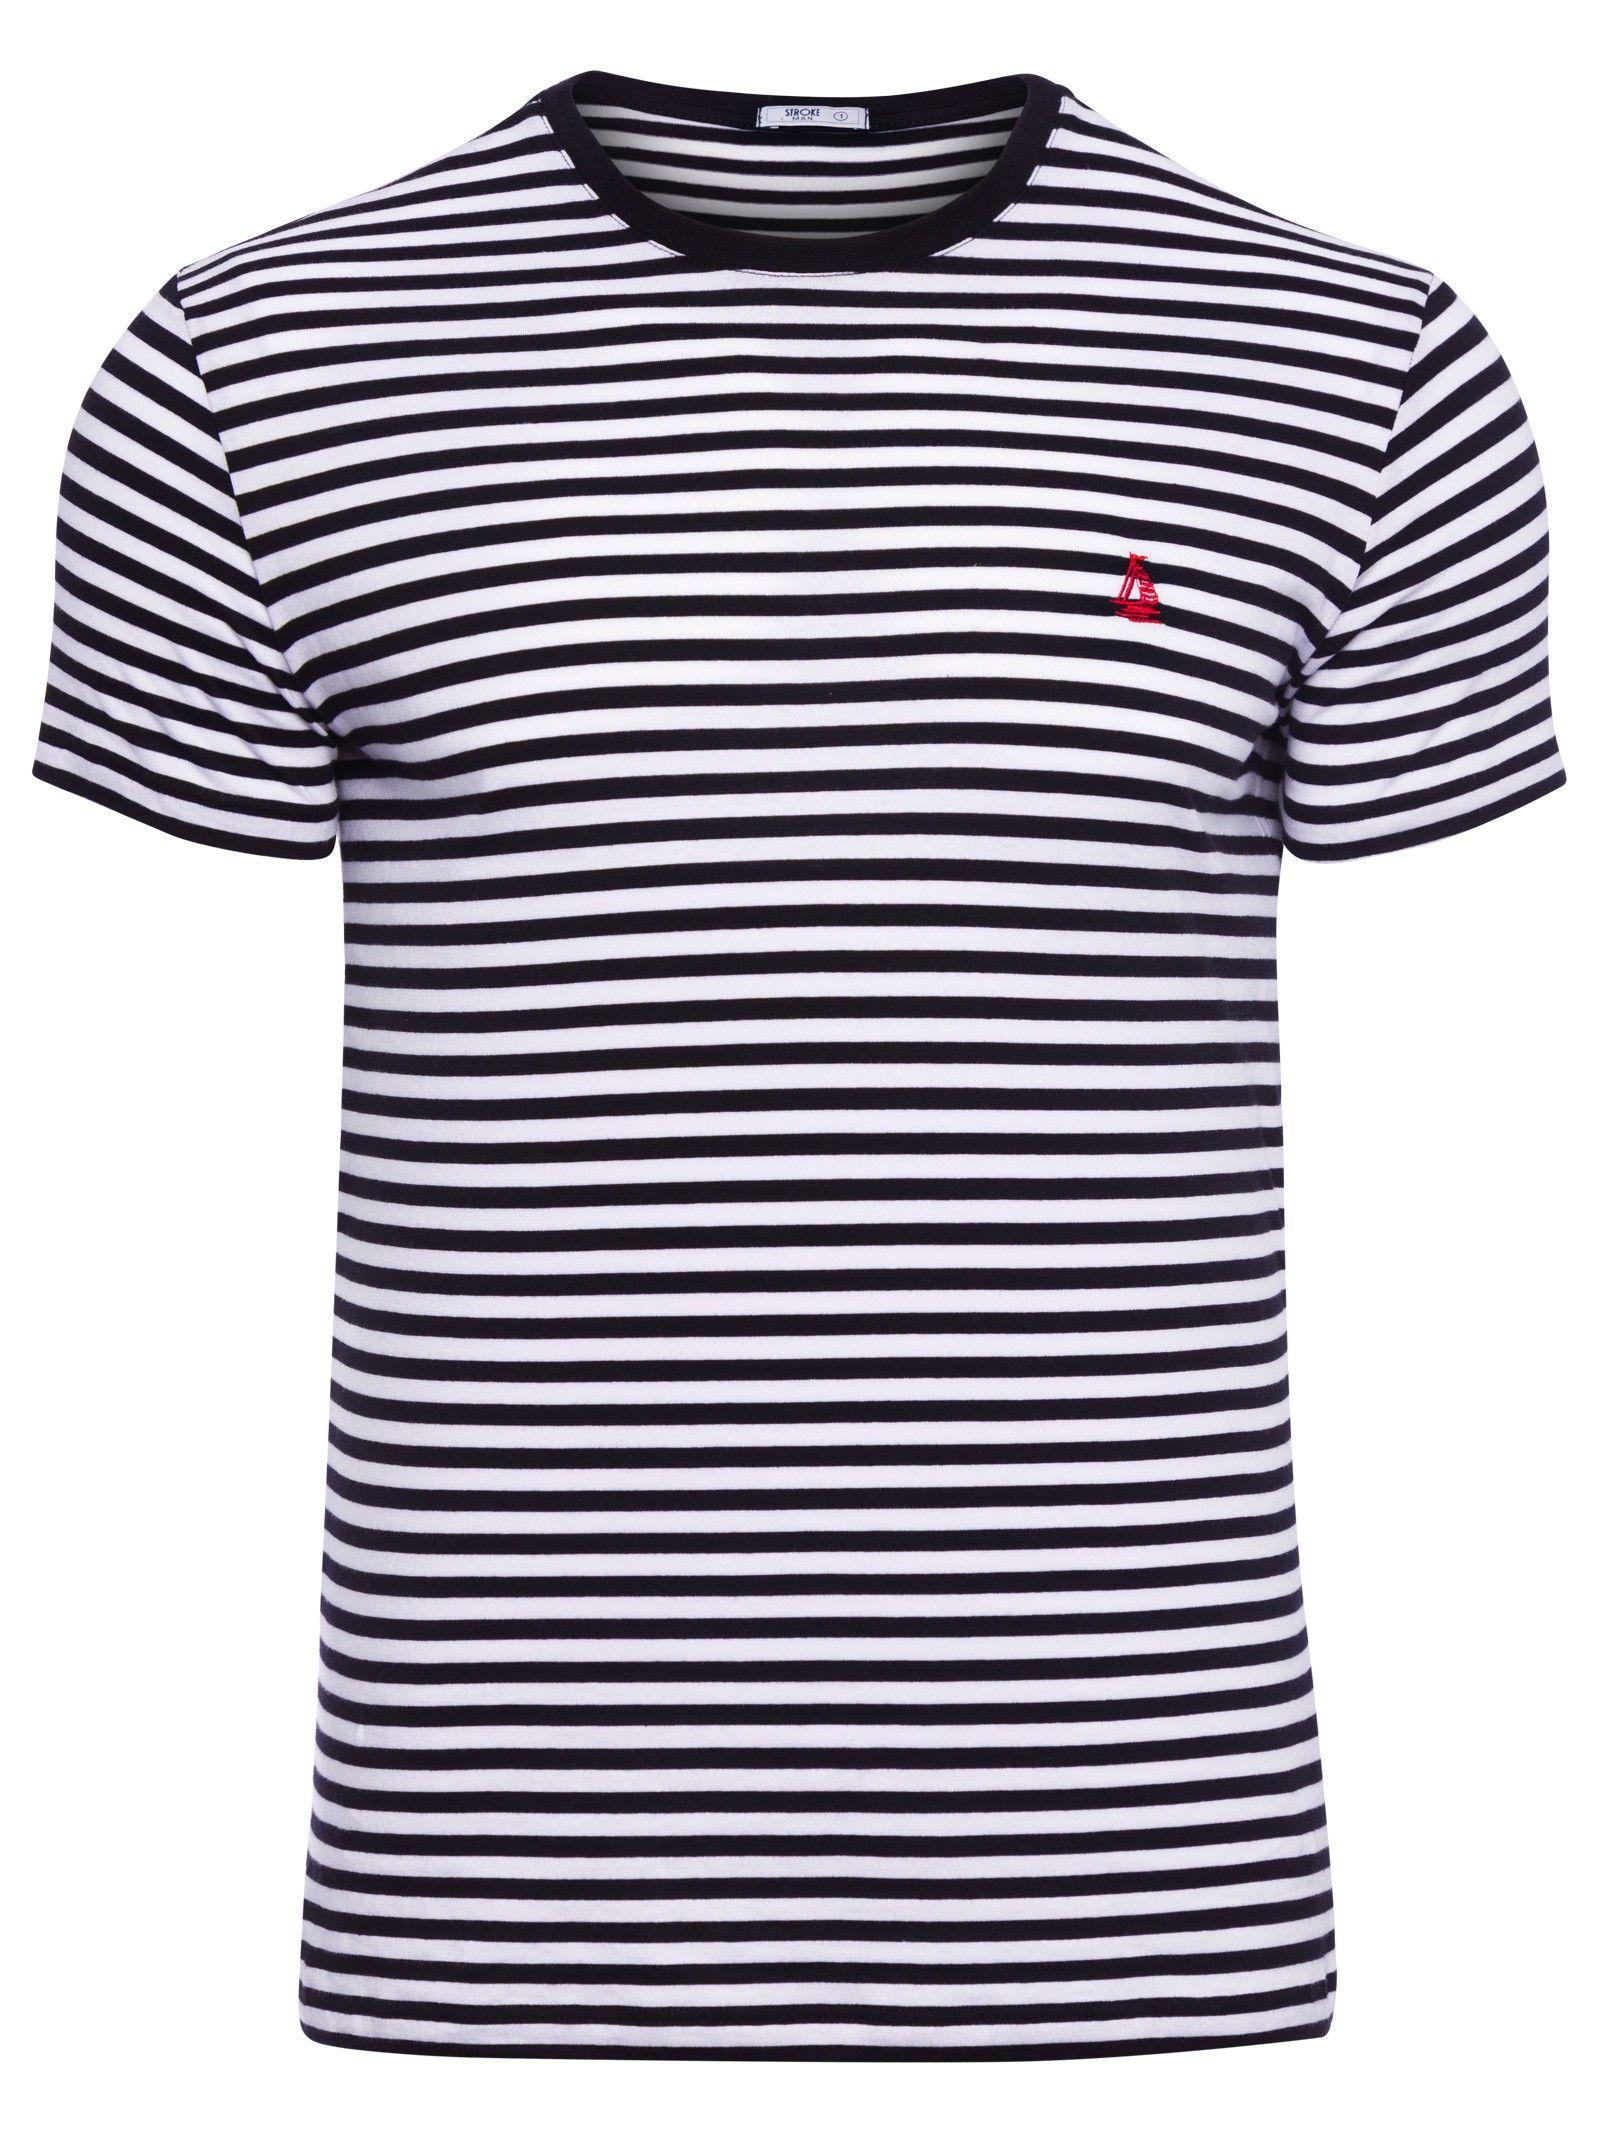 Camiseta Masculina - Stroke Man - Preto e Branco - Shop2gether ... 459b942028